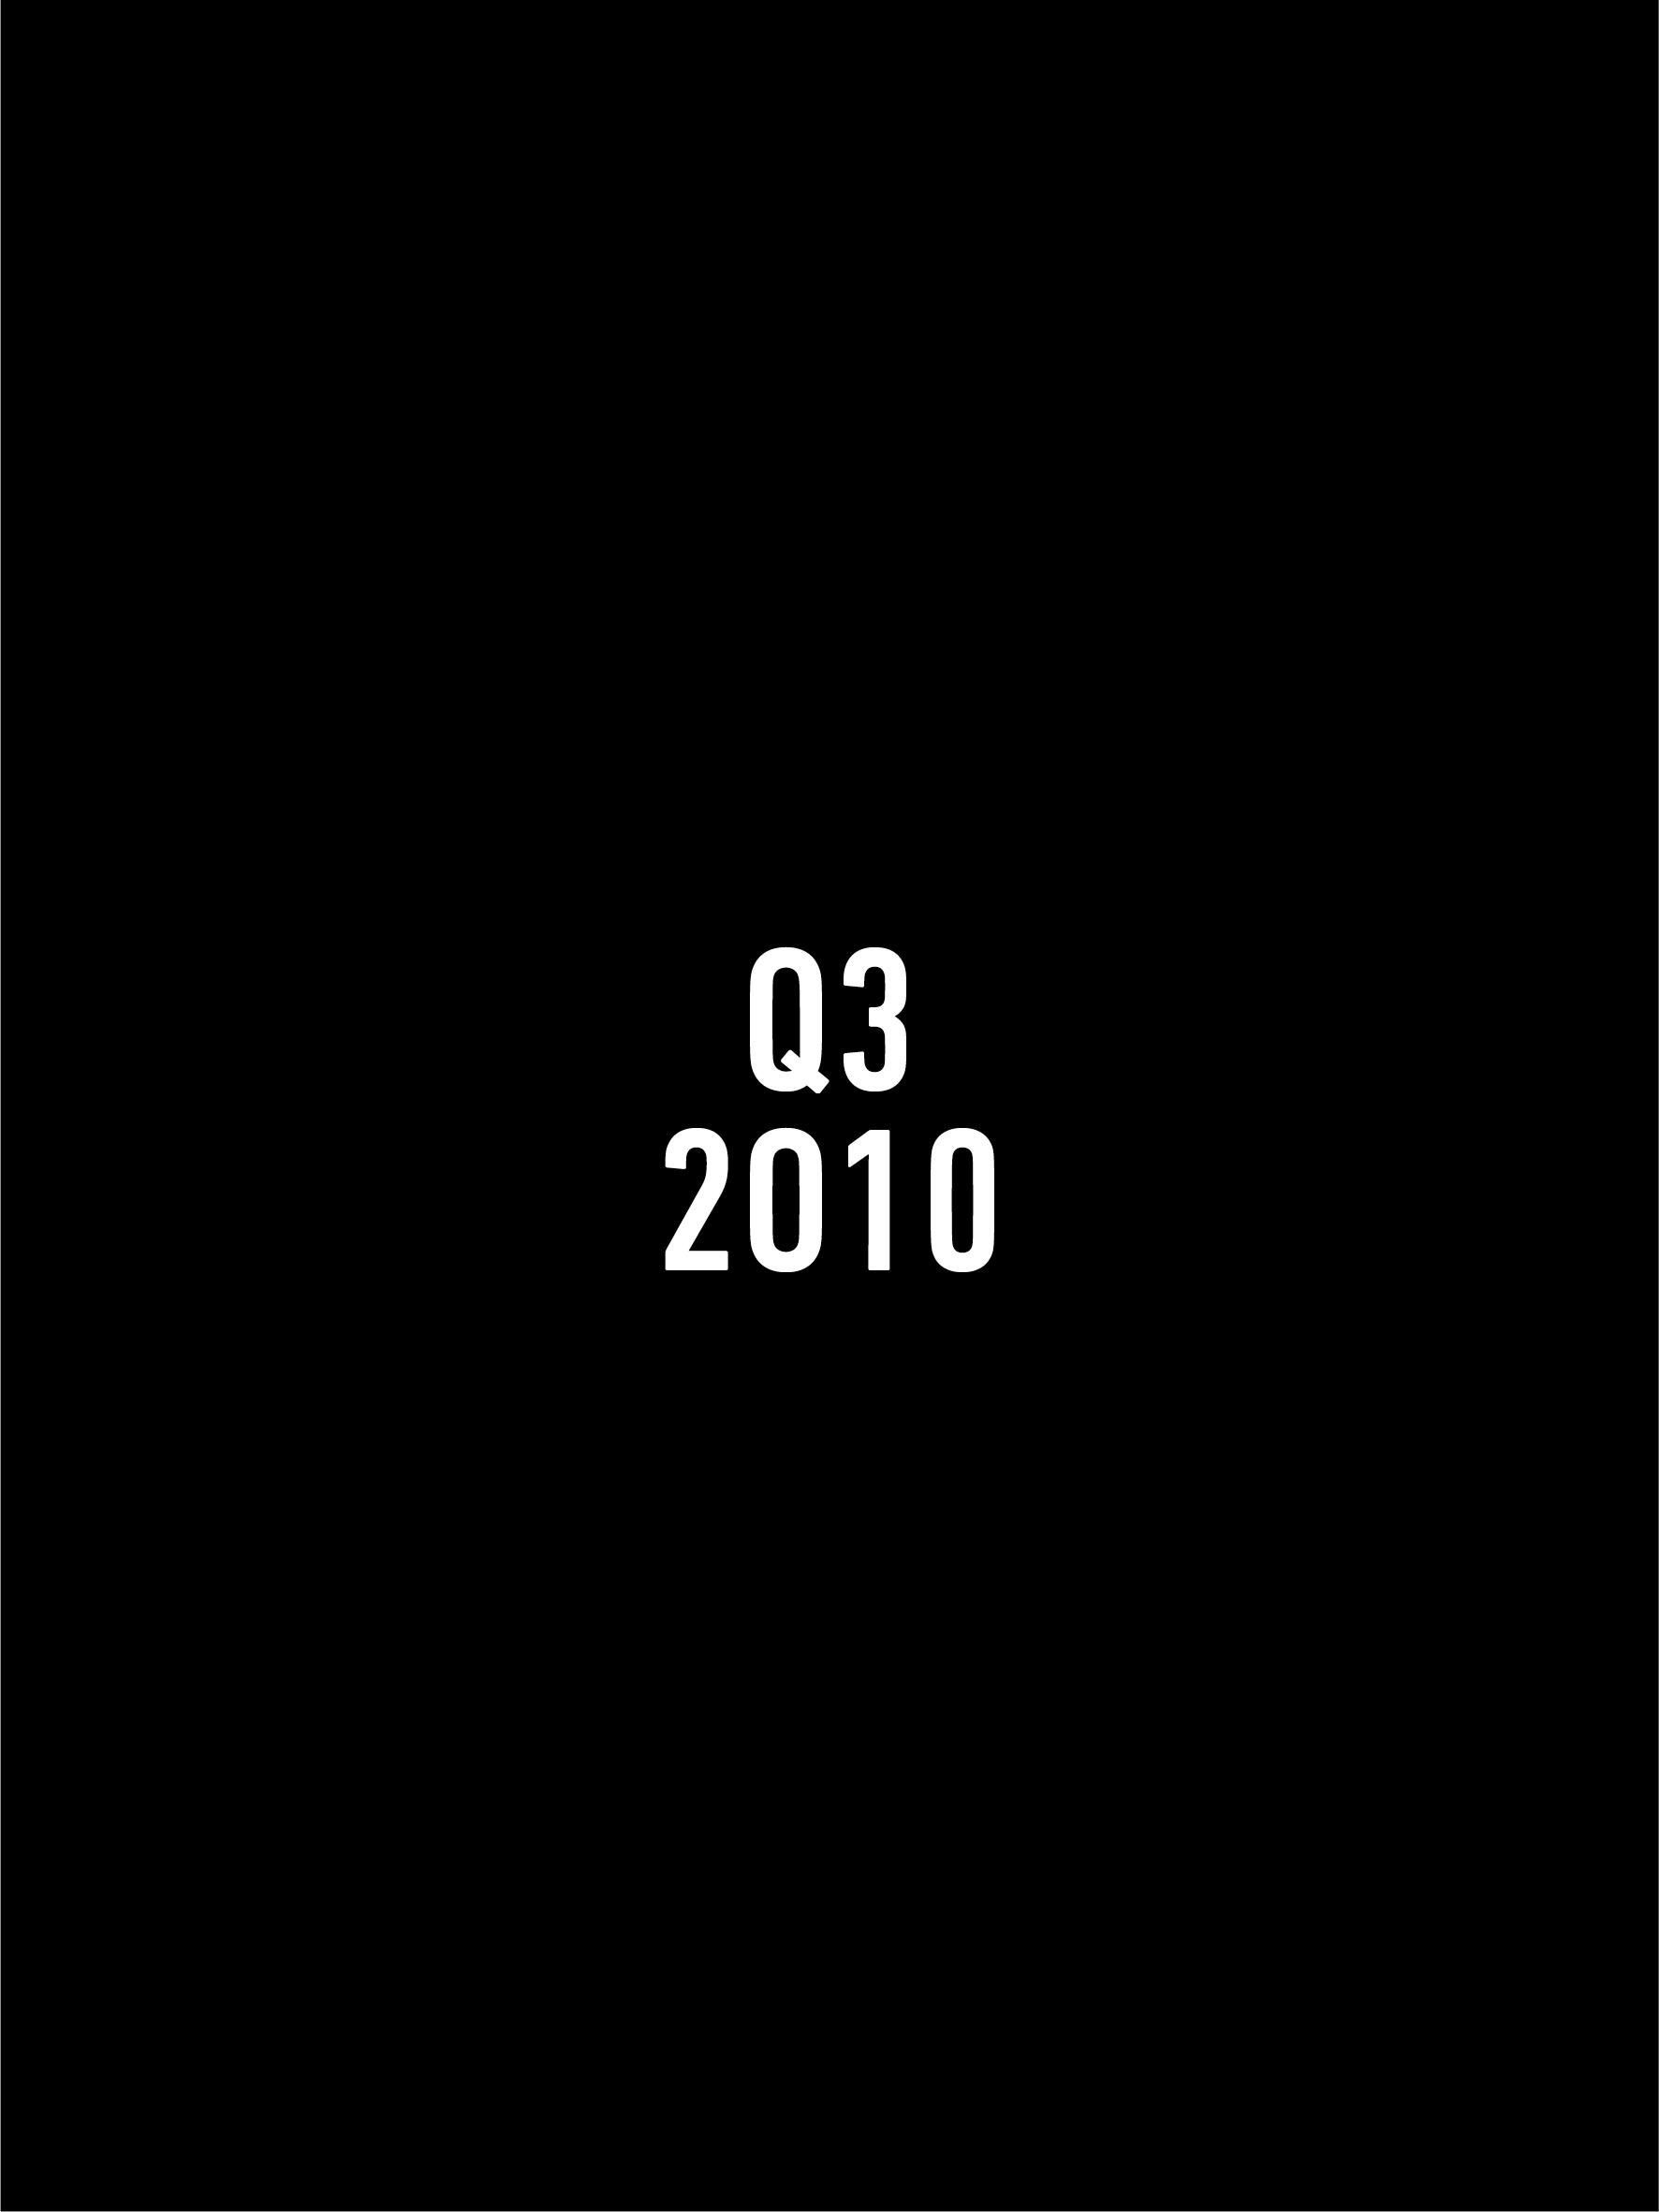 Quarterley 20103.jpg